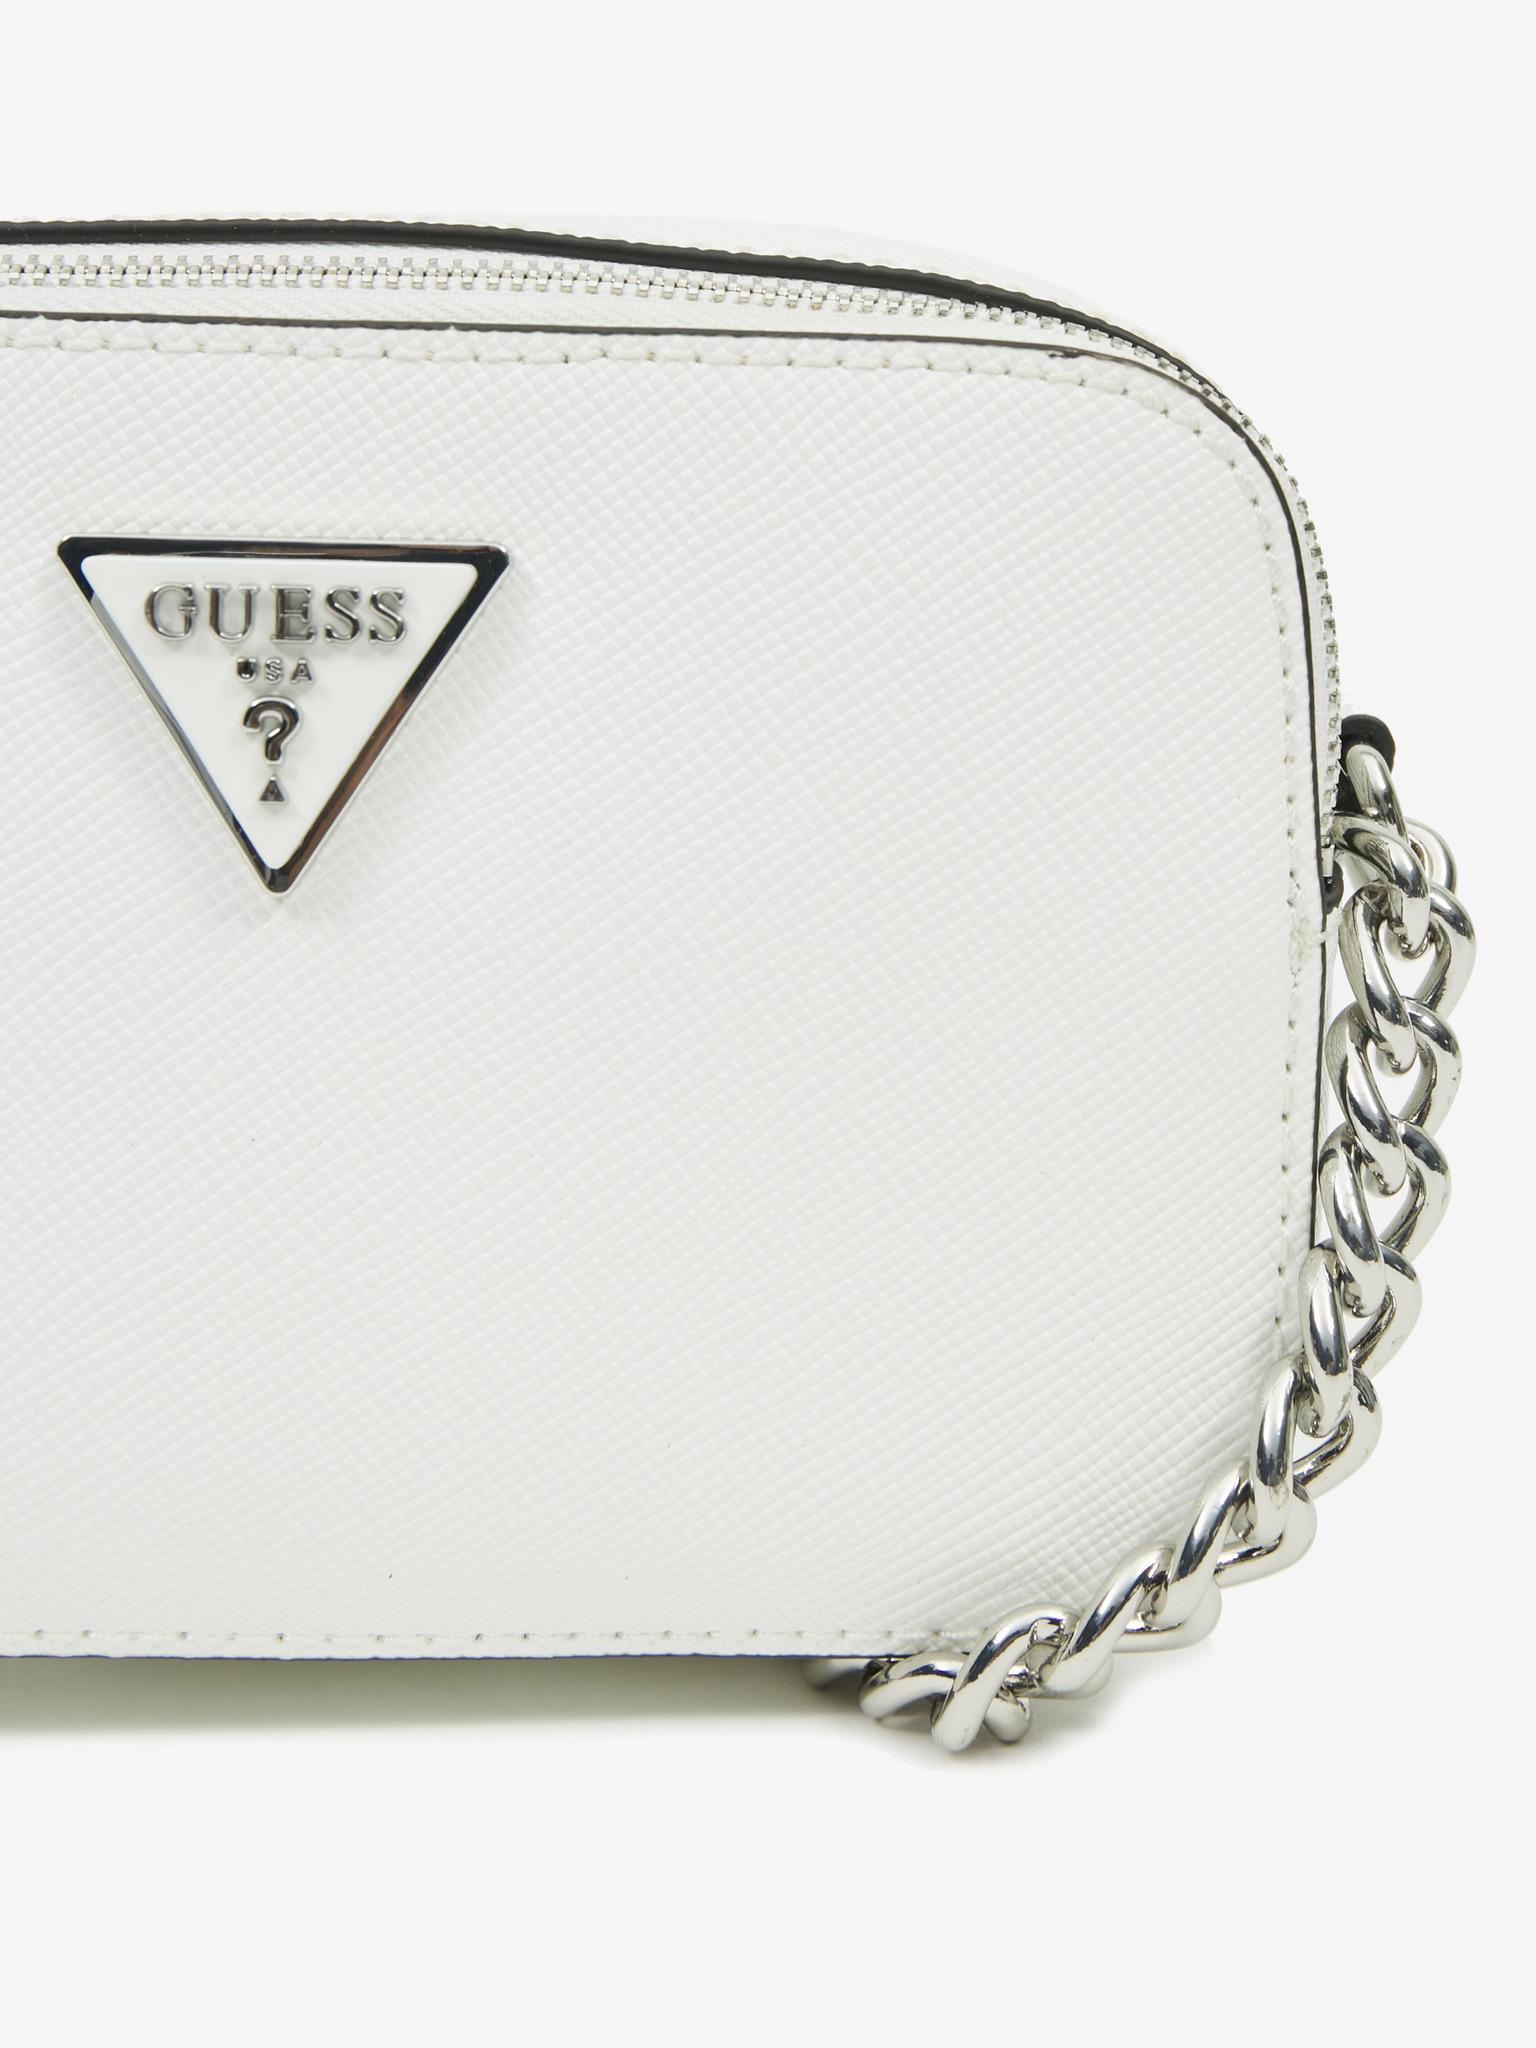 Guess Women's bag white